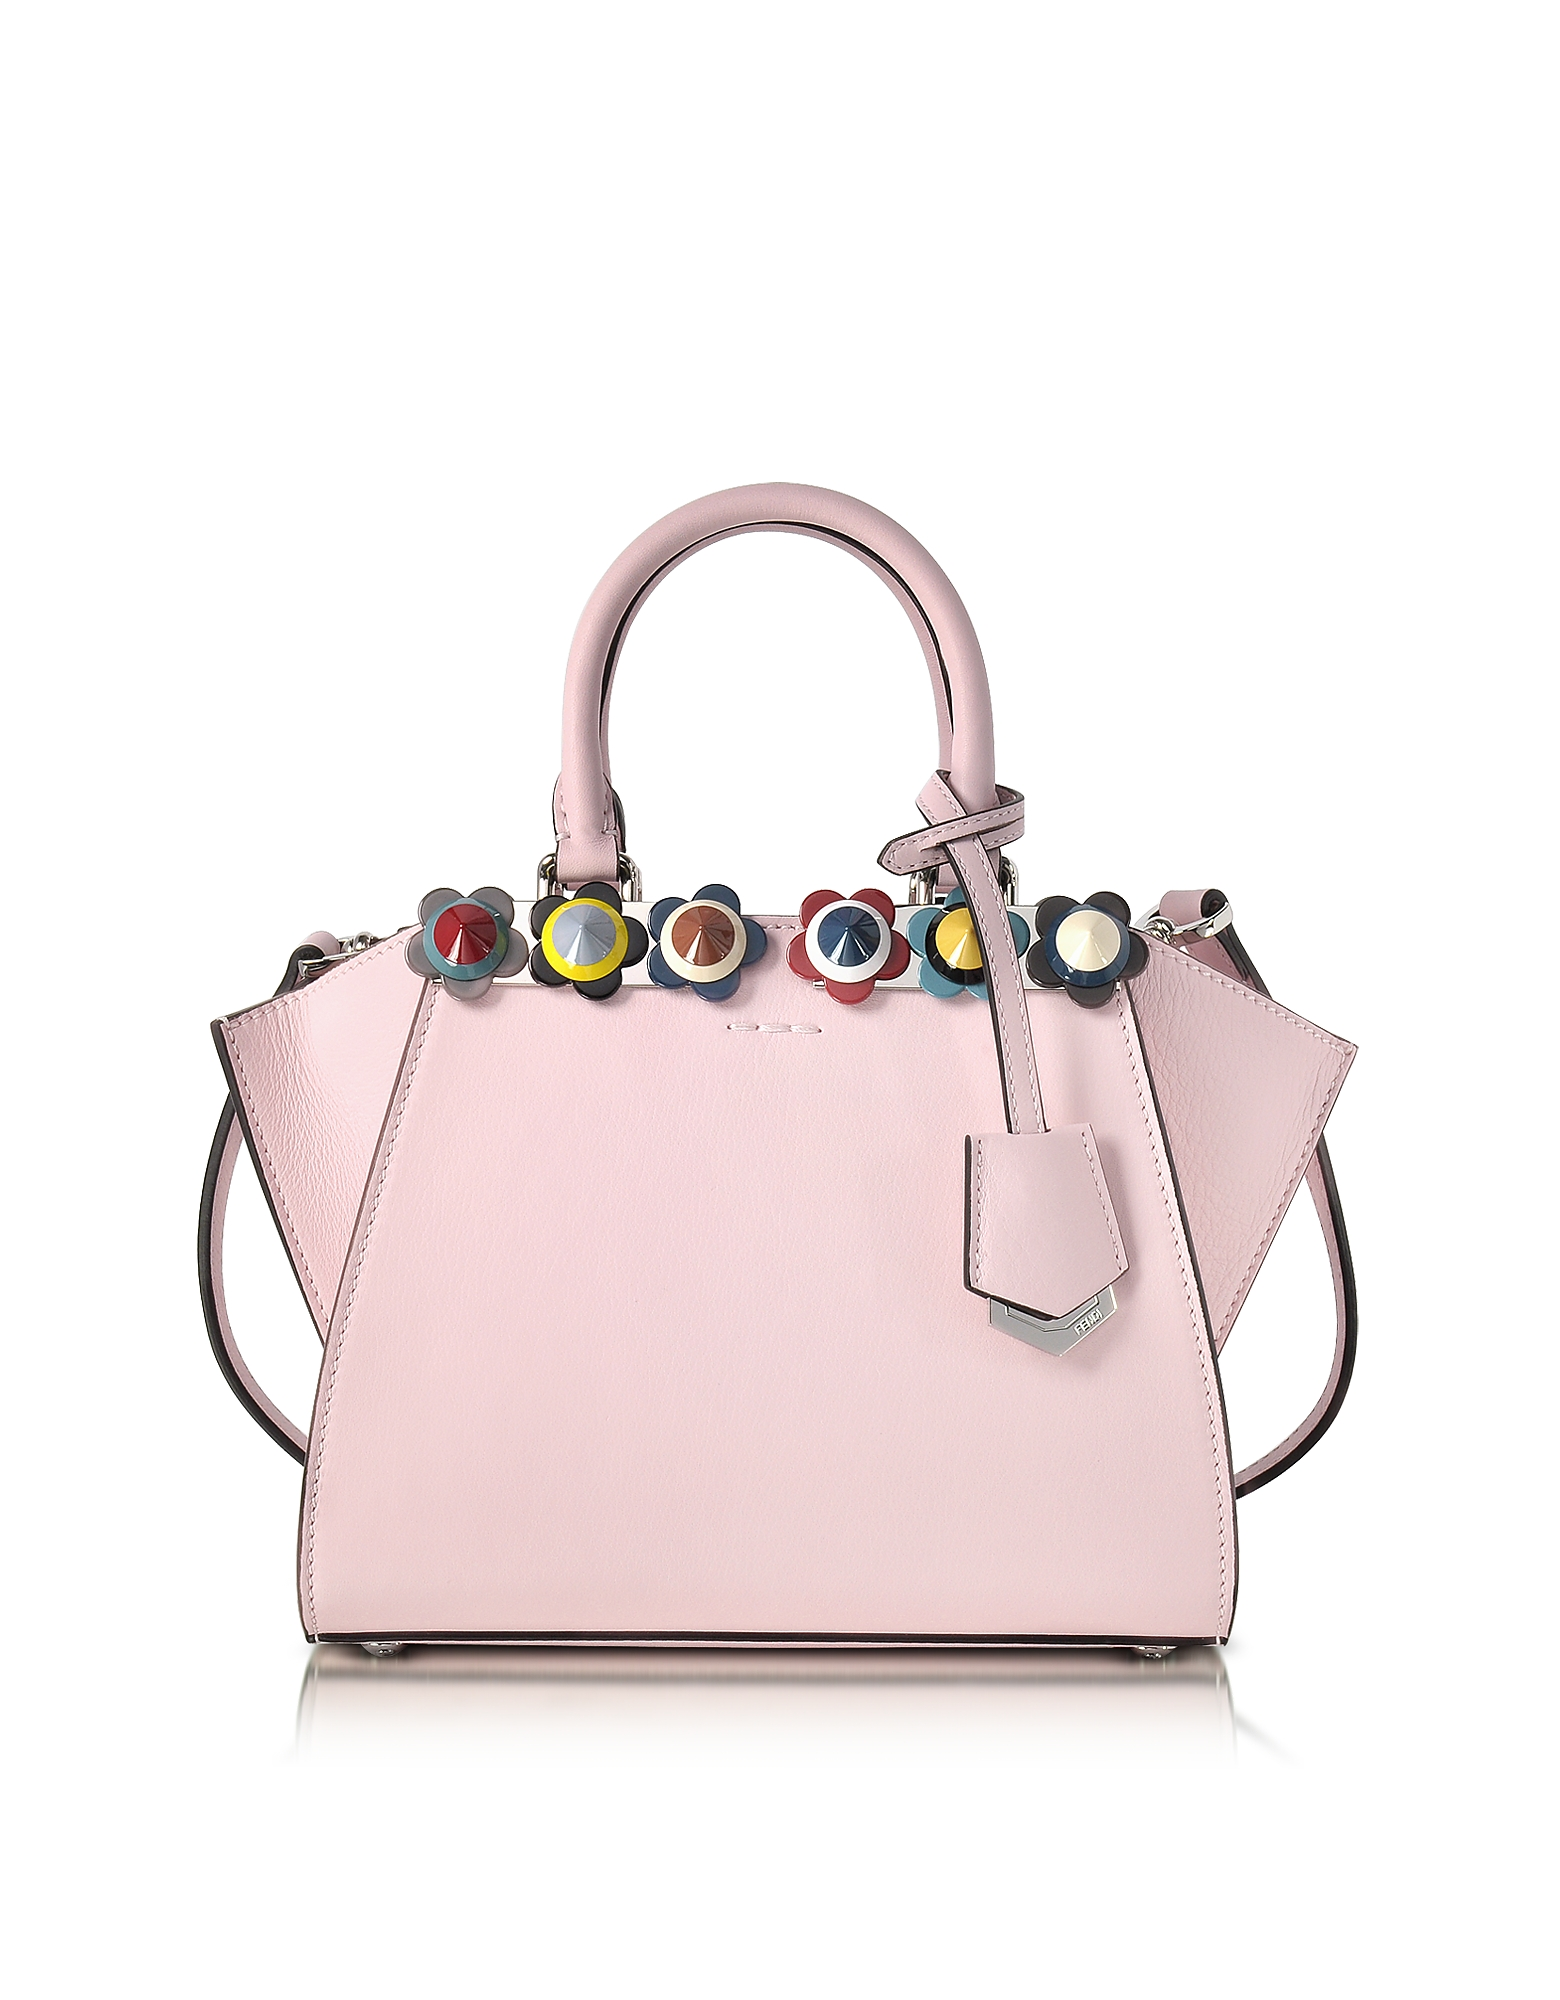 Fendi Mini 3Jours - Розовая Кожаная Сумка Tote с Радужными Цветами